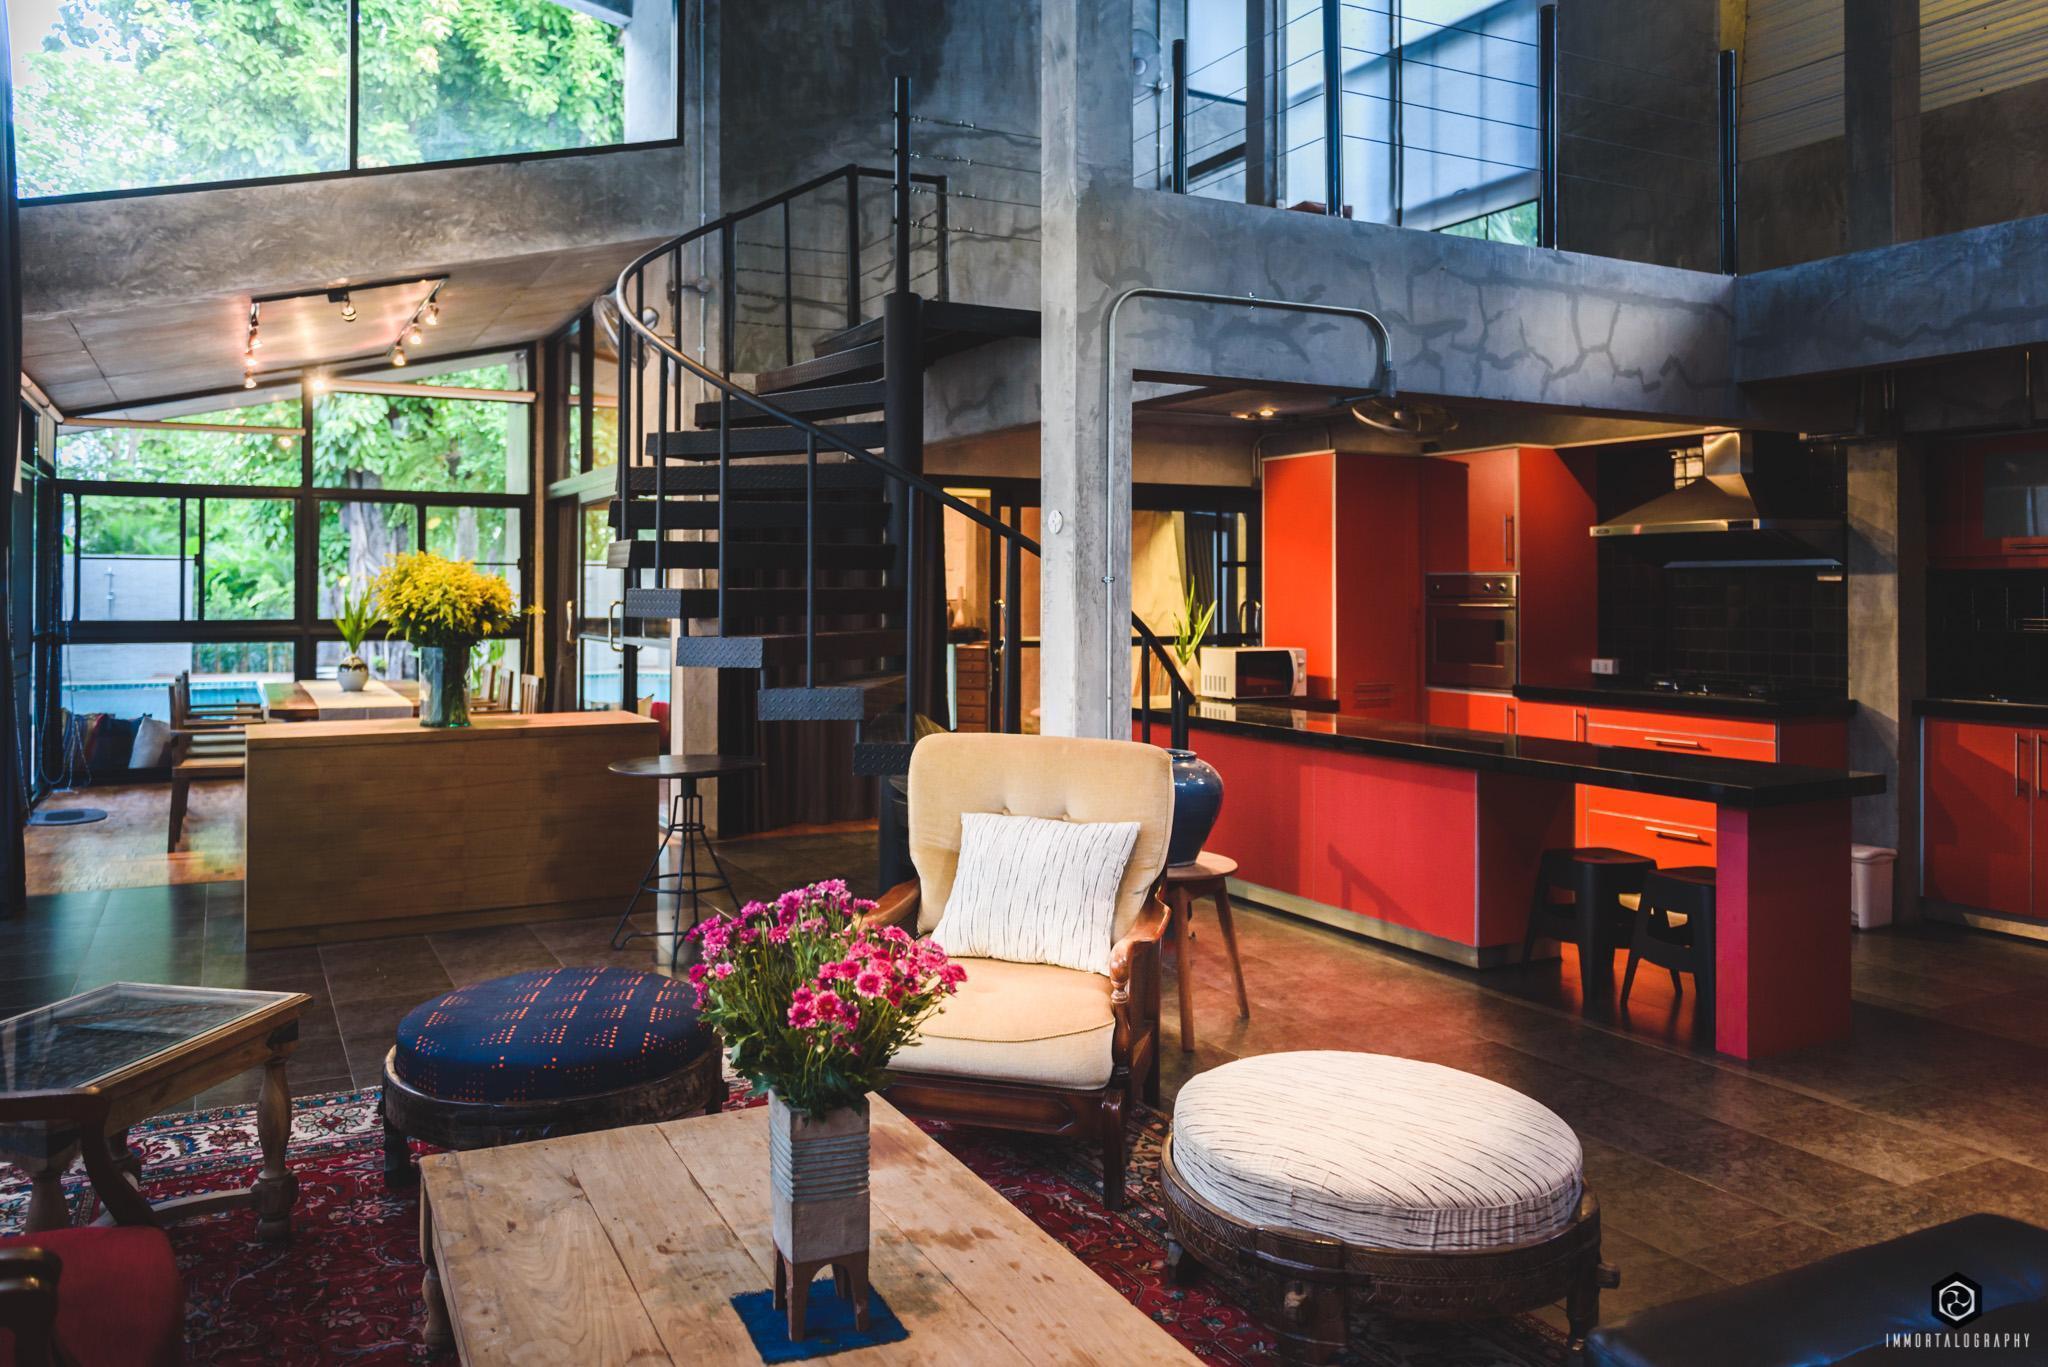 Chada Pool Villa บ้านเดี่ยว 2 ห้องนอน 3 ห้องน้ำส่วนตัว ขนาด 250 ตร.ม. – ห้วยแก้ว